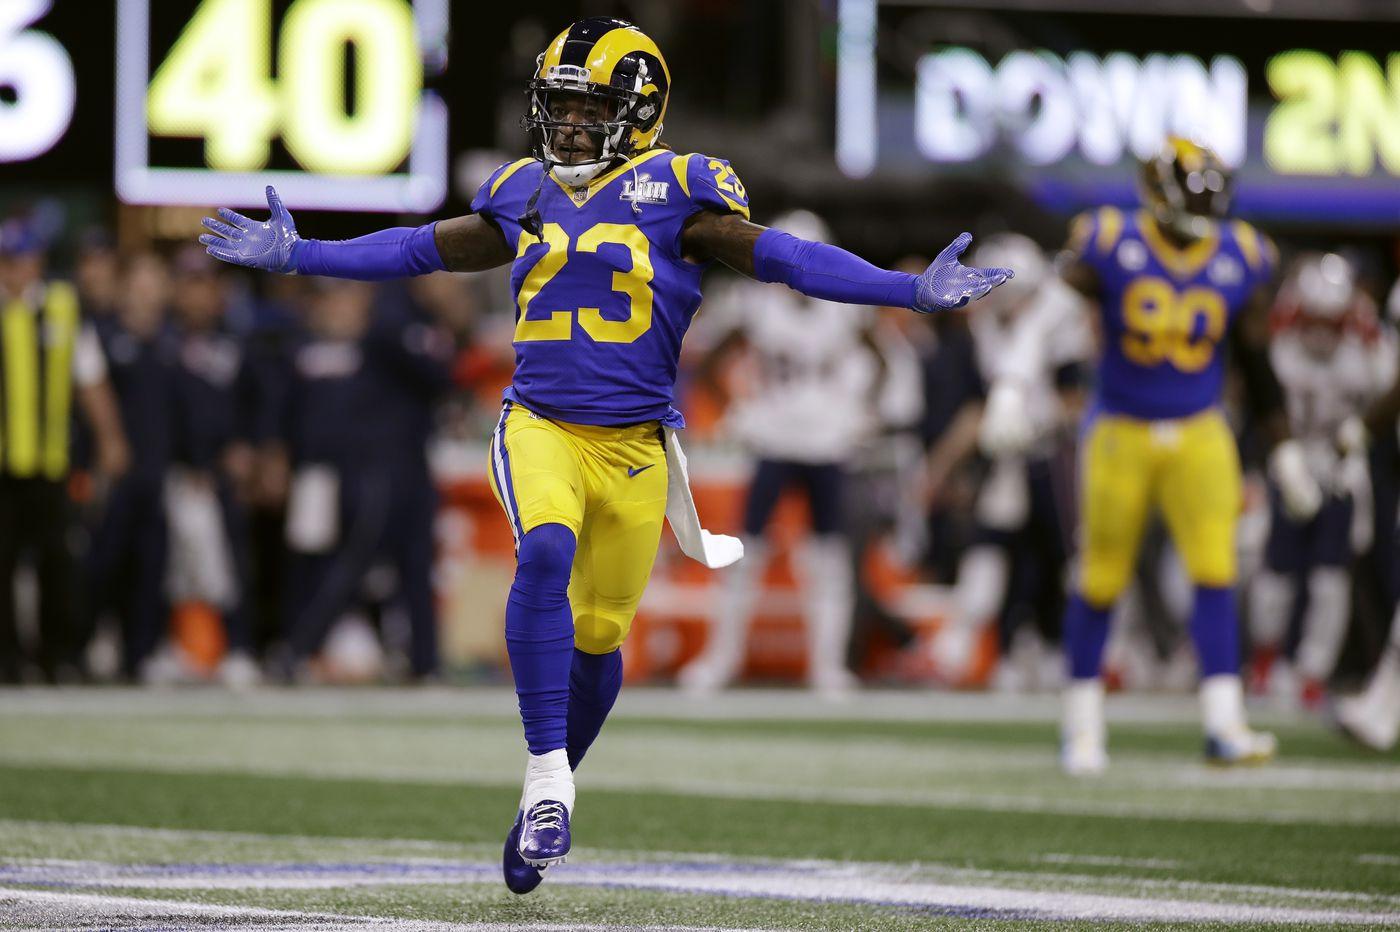 Super Bowl 2019: Rams' Nickell Robey-Coleman backs up criticism of Patriots' Tom Brady with big play; Kurt Warner on Nick Foles